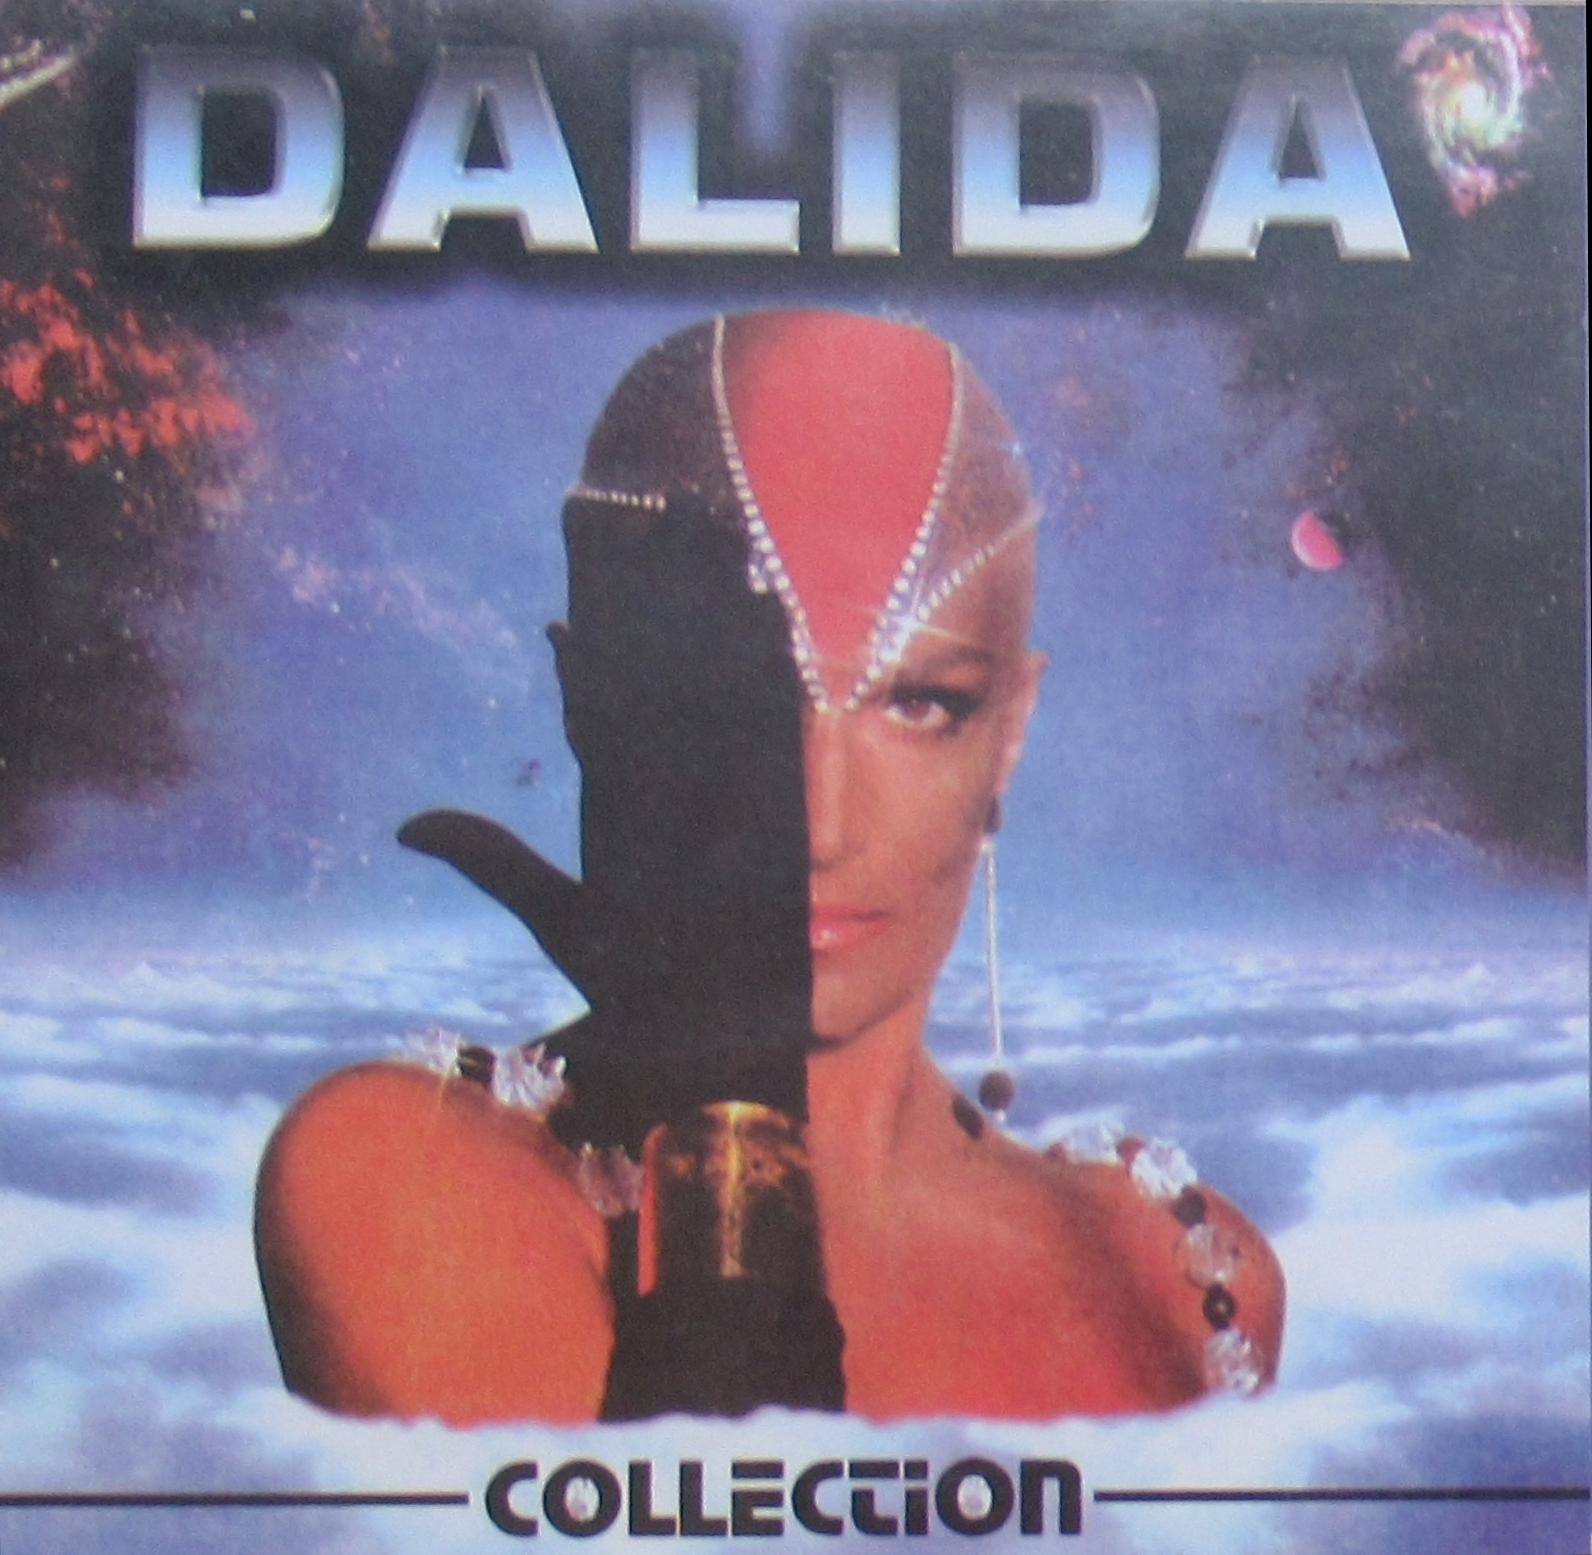 C.D : Dalida collection